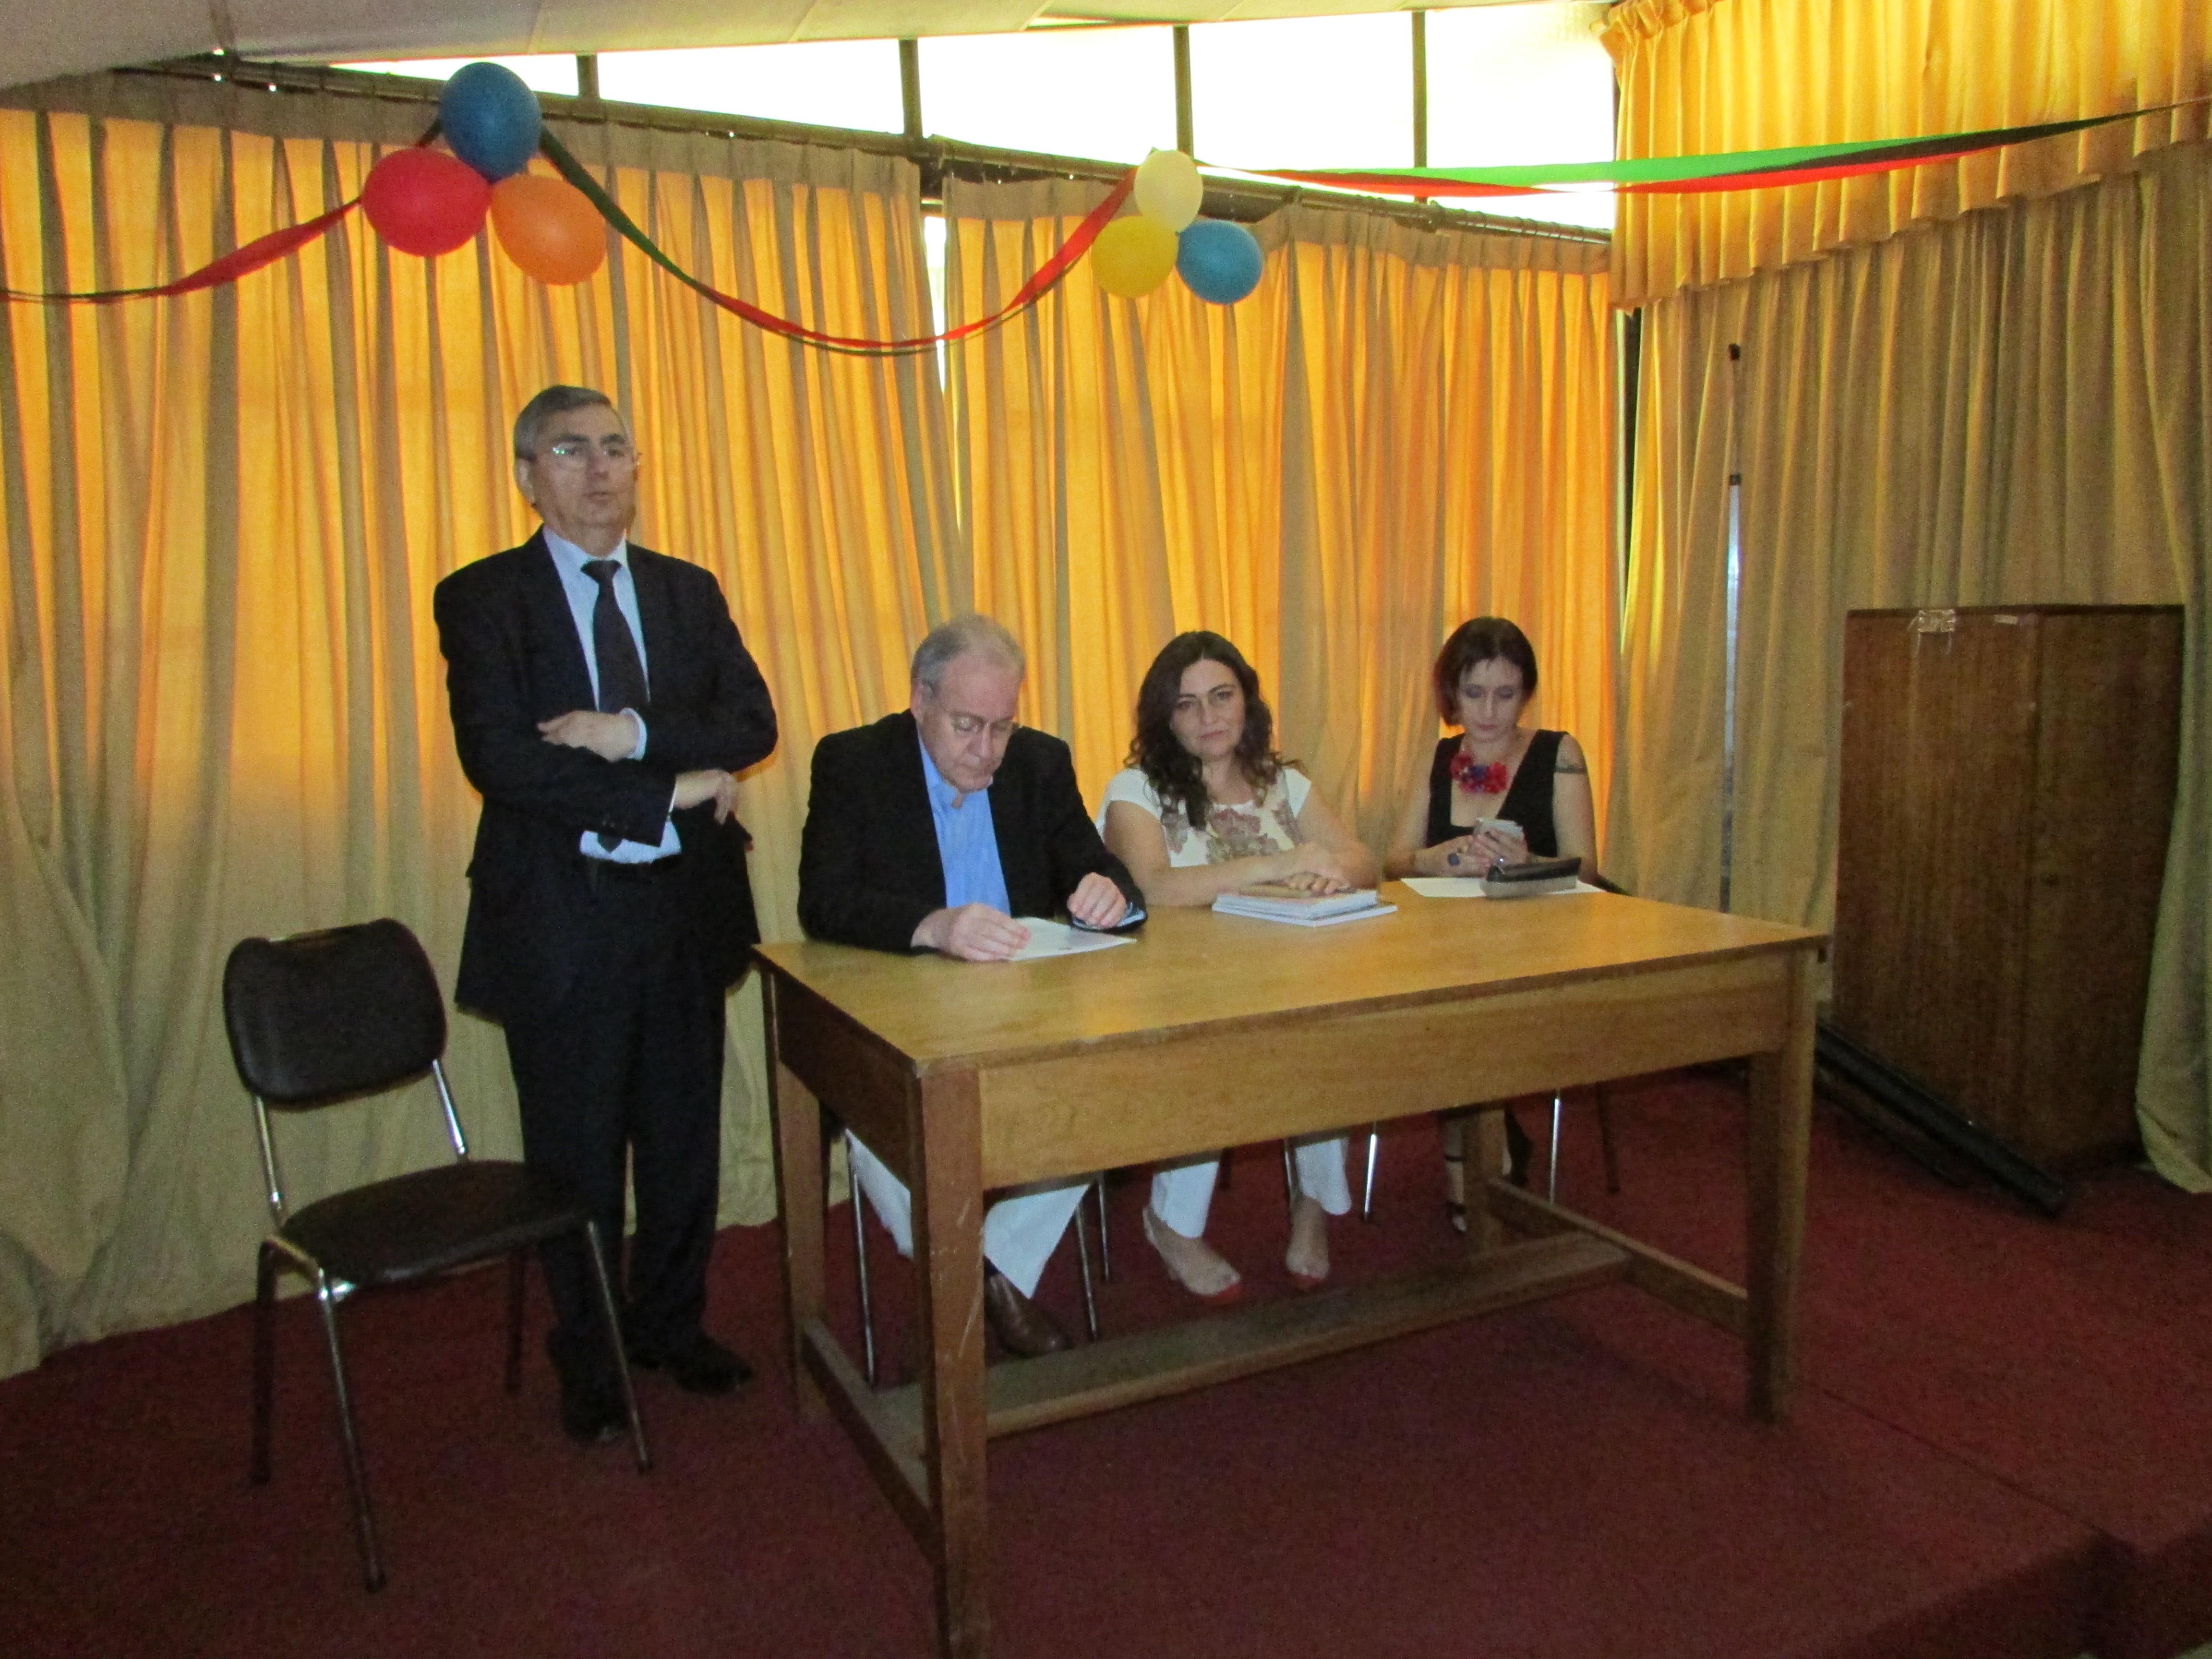 FTH realiza su Asamblea General Ordinaria - 21 Diciembre 2016